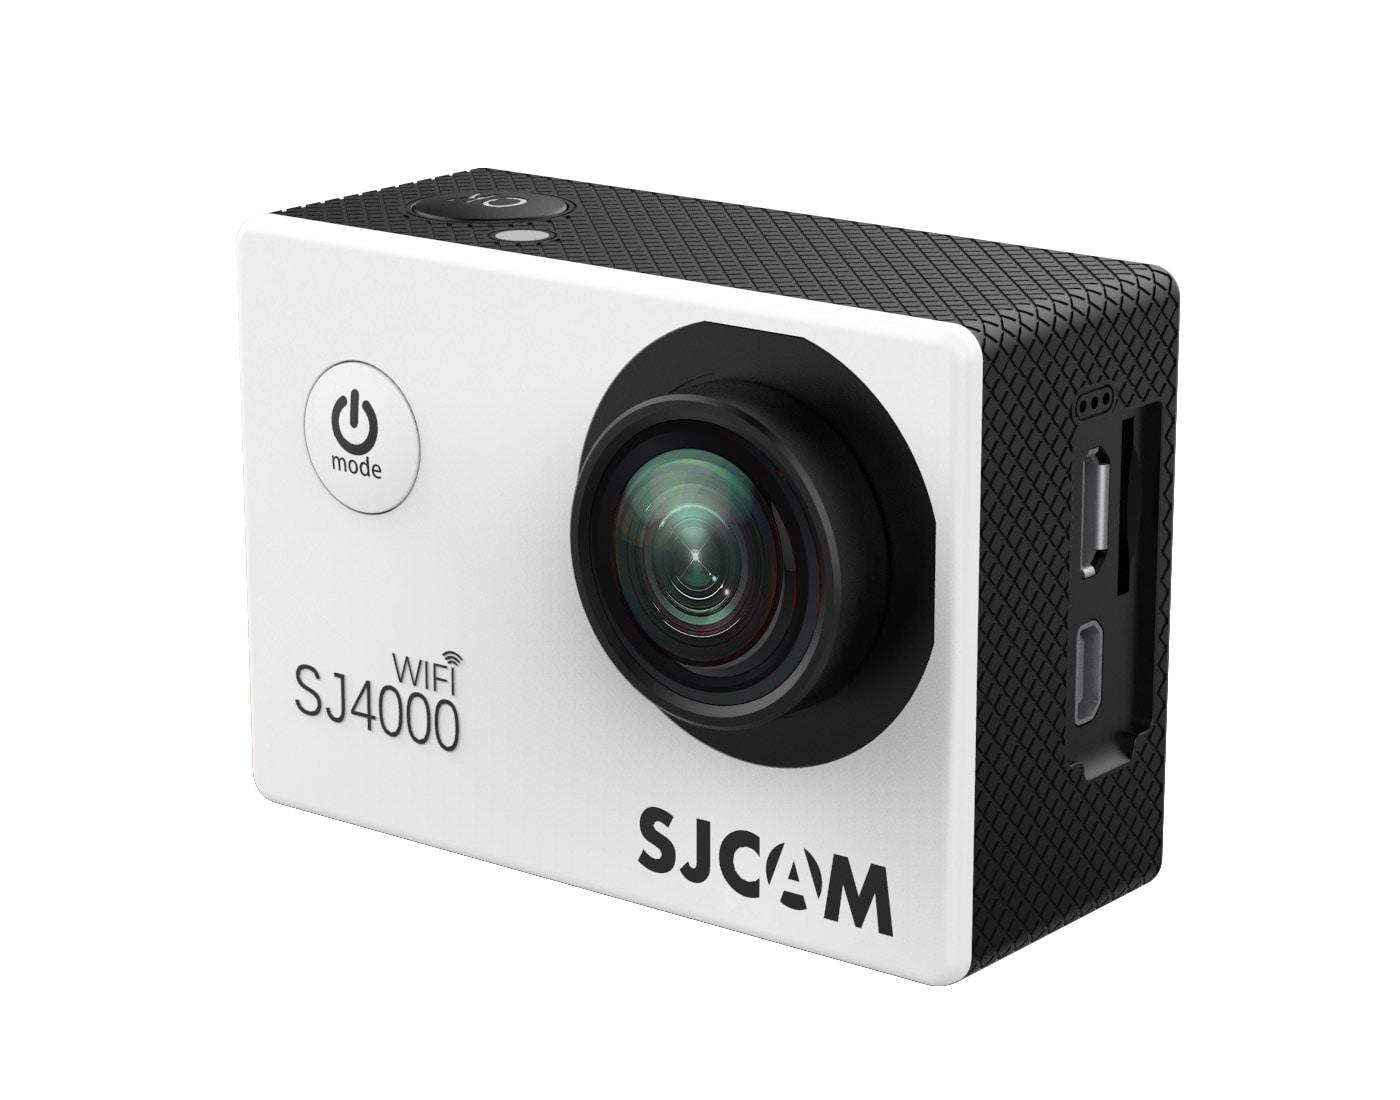 SJCAM SJ4000 WIFI Action Camera FHD1080P waterproof Underwater Camera 12MP Sports Camcorder  Red - 7